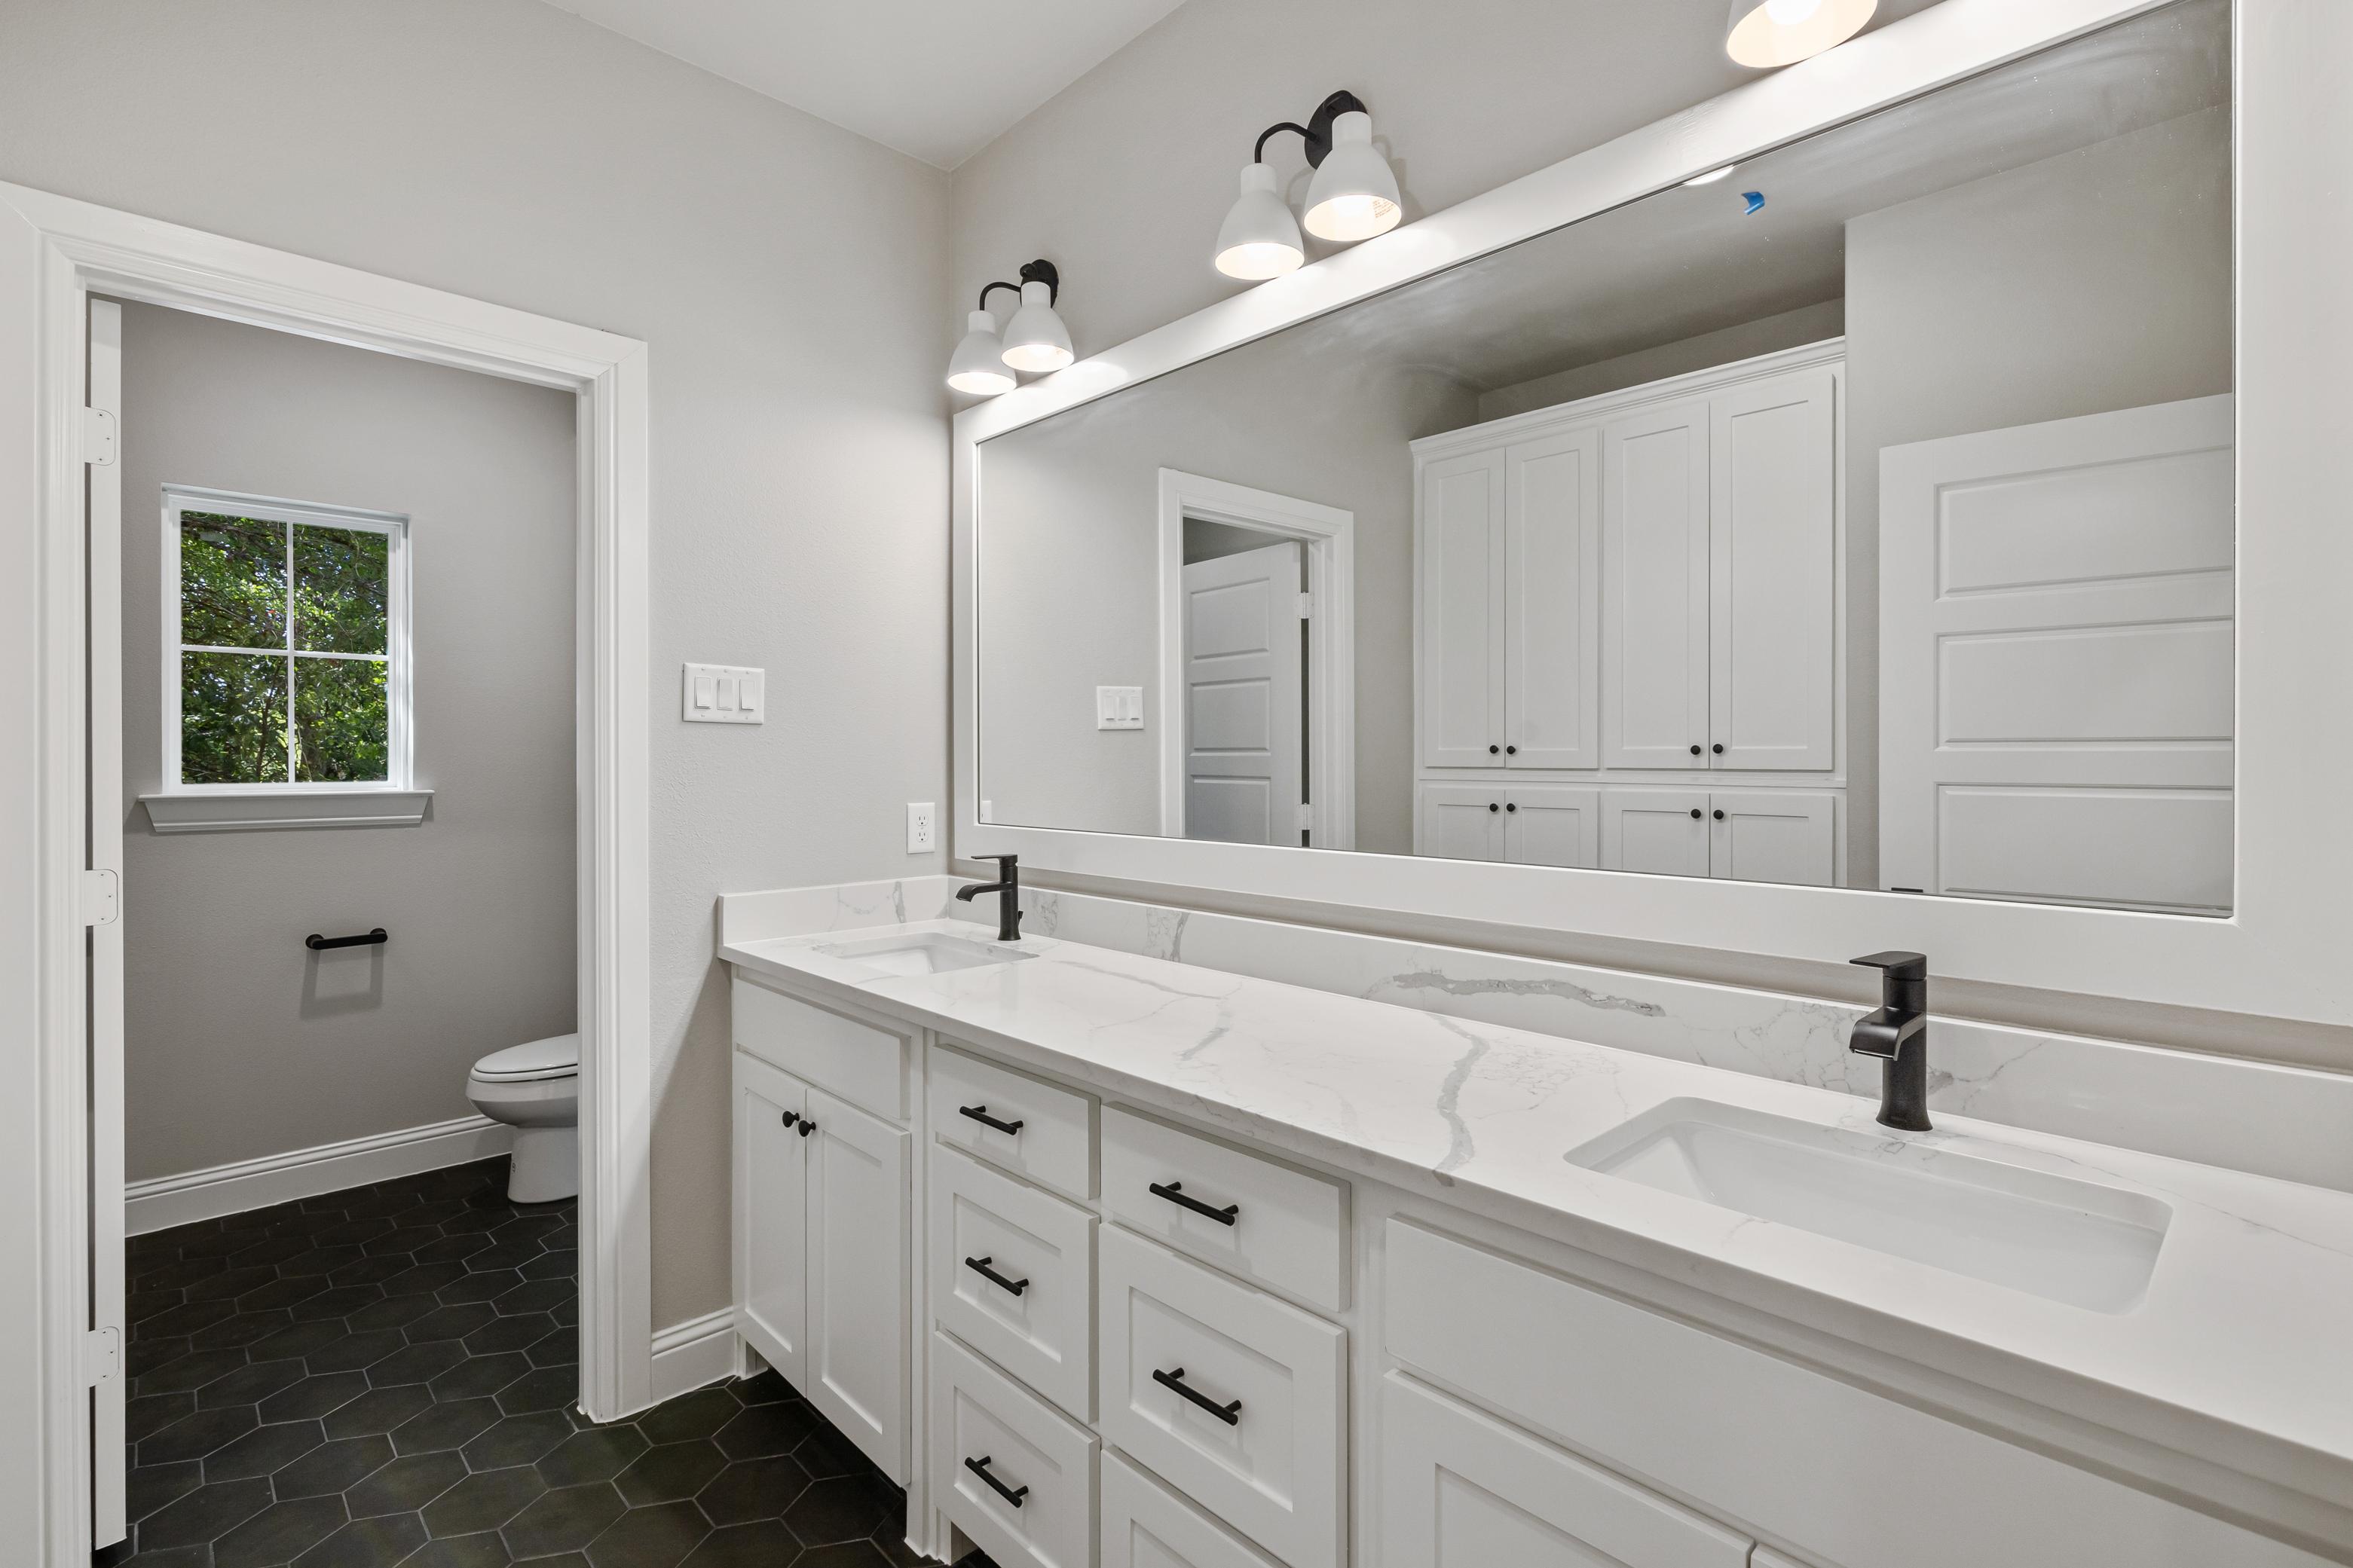 https://0201.nccdn.net/1_2/000/000/0b7/3aa/bathroom-2-full-view.jpg